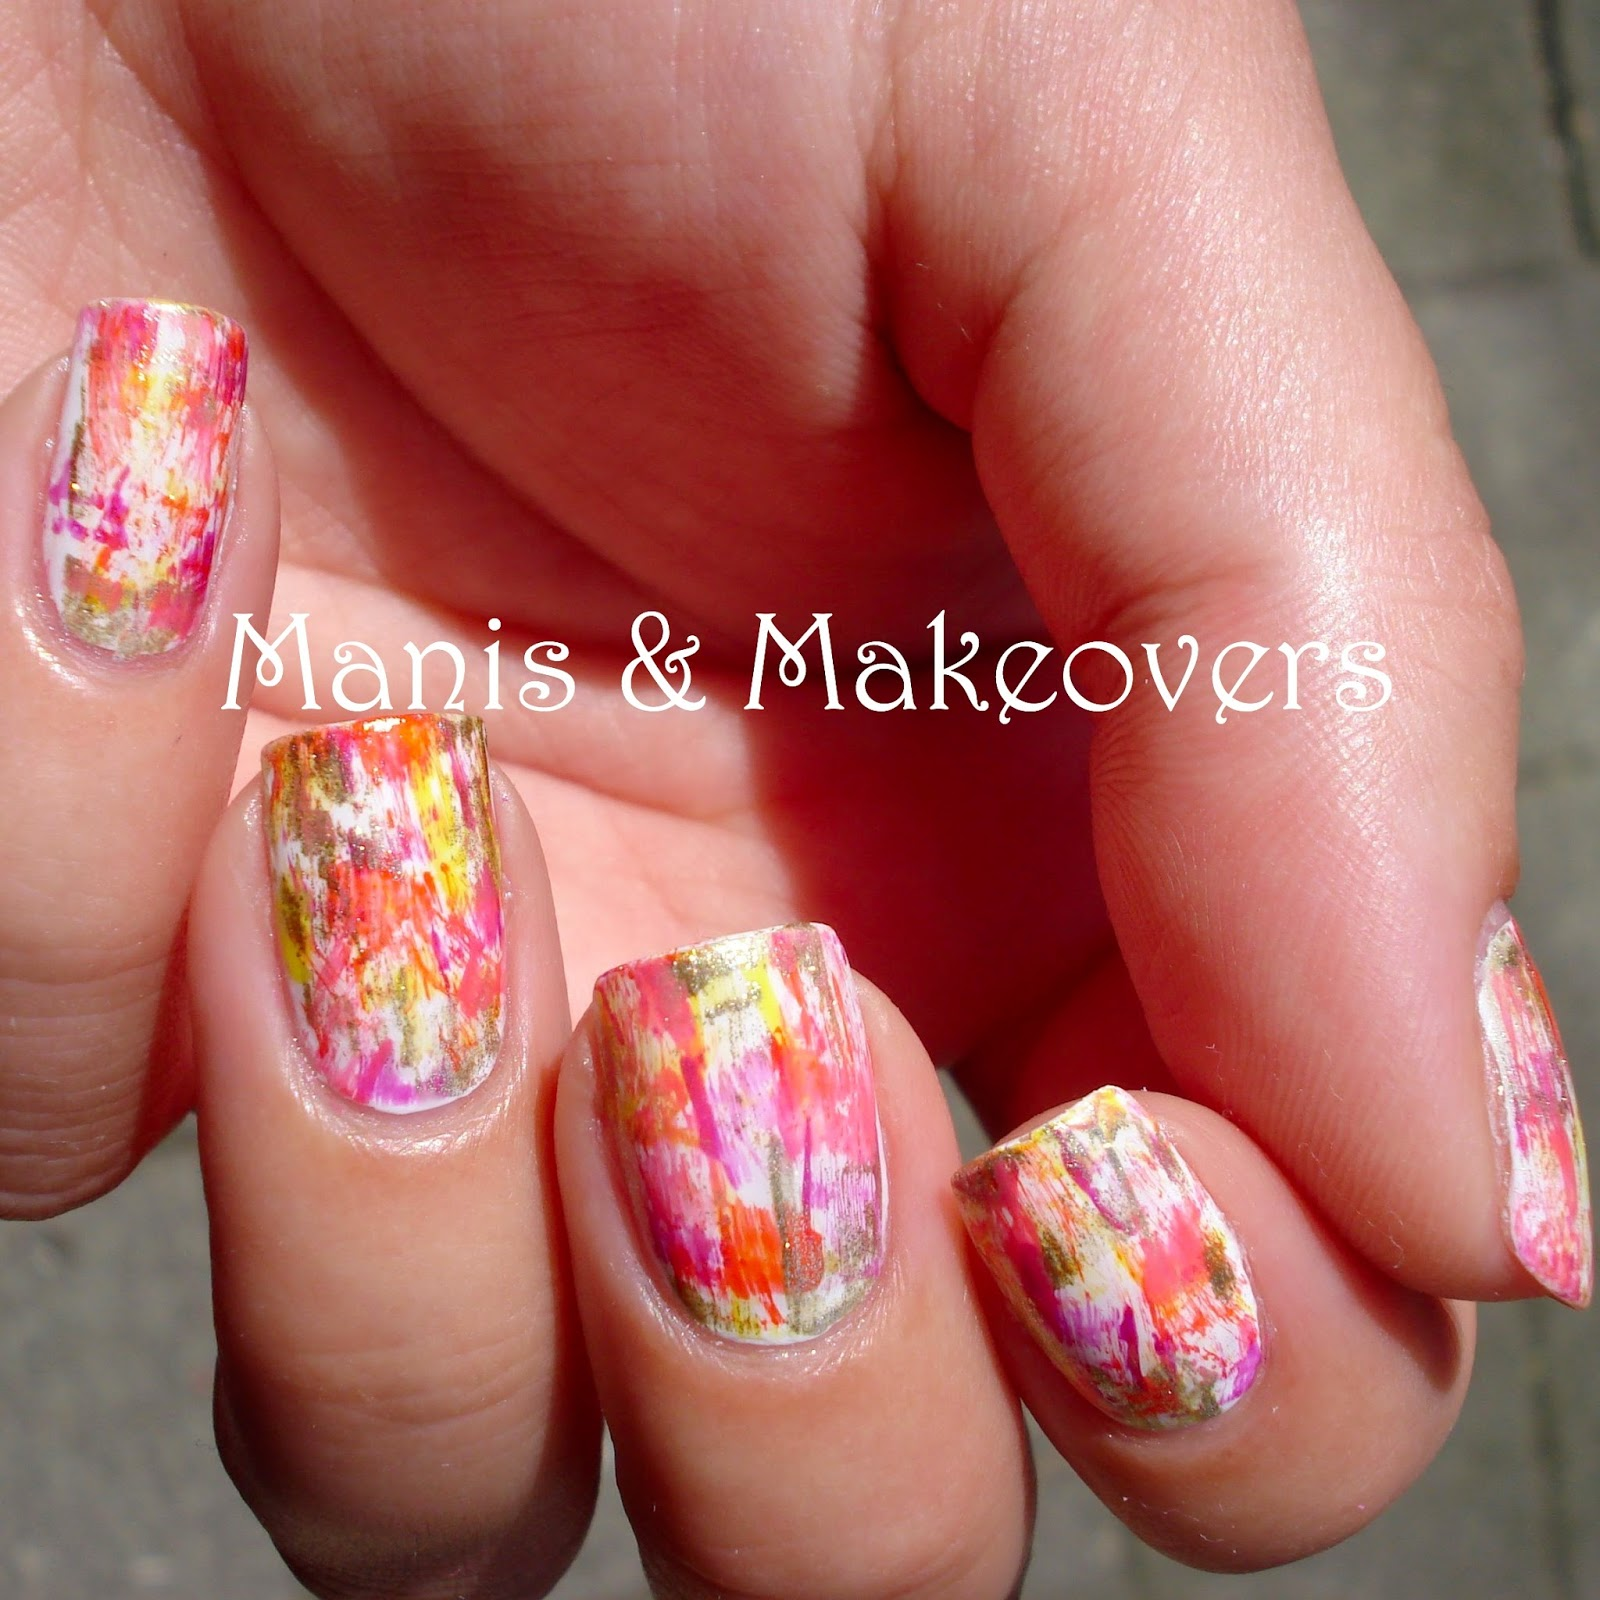 Manis & Makeovers: Tutorial Tuesday: Abstract Nail Art - No Tools ...